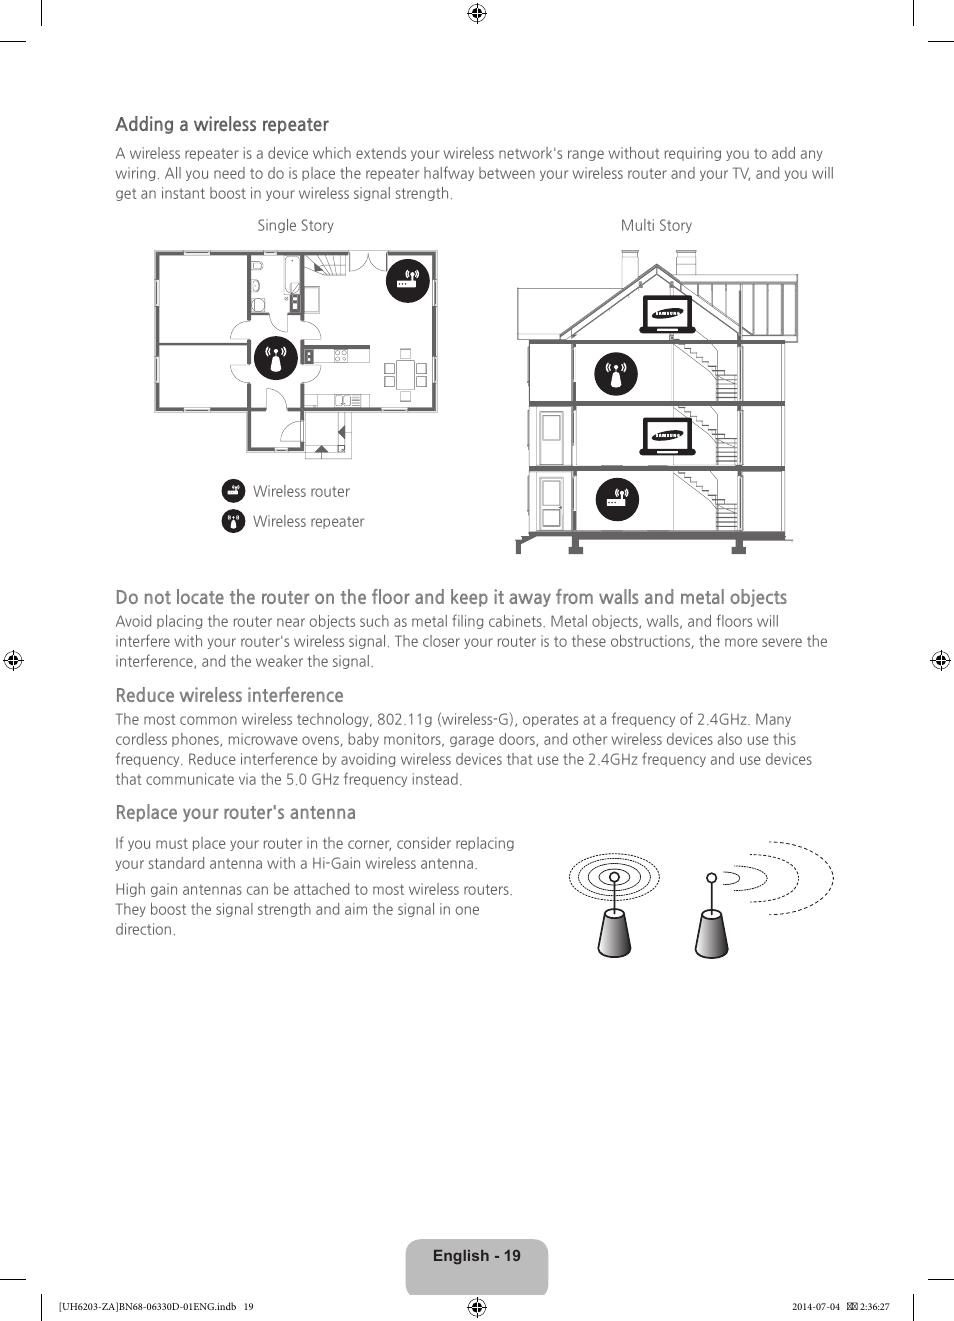 Samsung UN40H5201AFXZA User Manual   Page 19 / 32   Also for:  UN55H6203AFXZA, UN60H6203AFXZA, UN46H5203AFXZA, UN65H6203AFXZA,  UN32H5203AFXZA, UN46H6203AFXZA ...